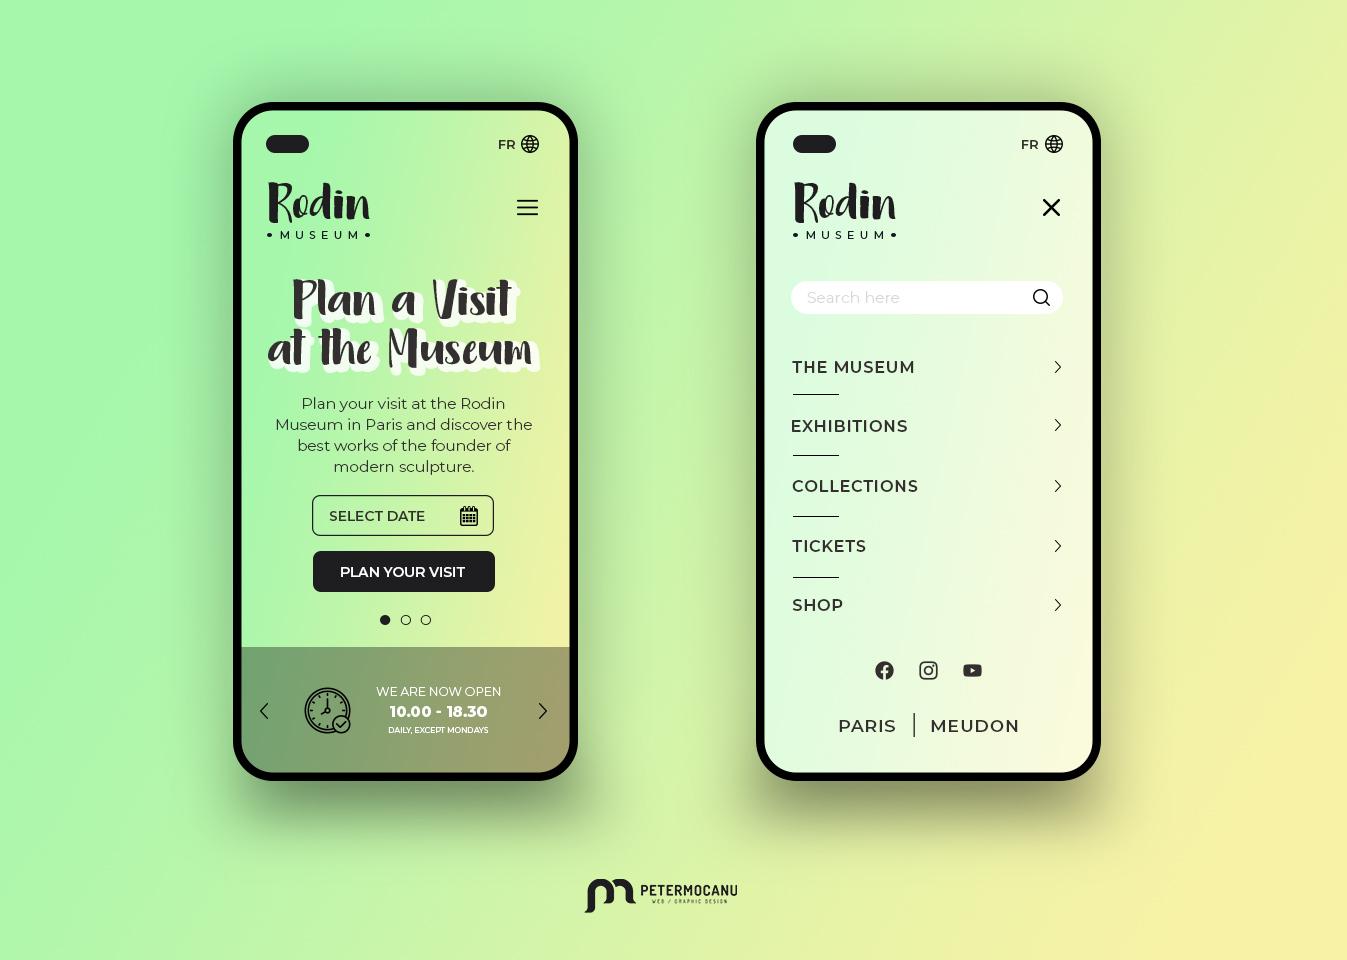 Rodin Museum UI redesign